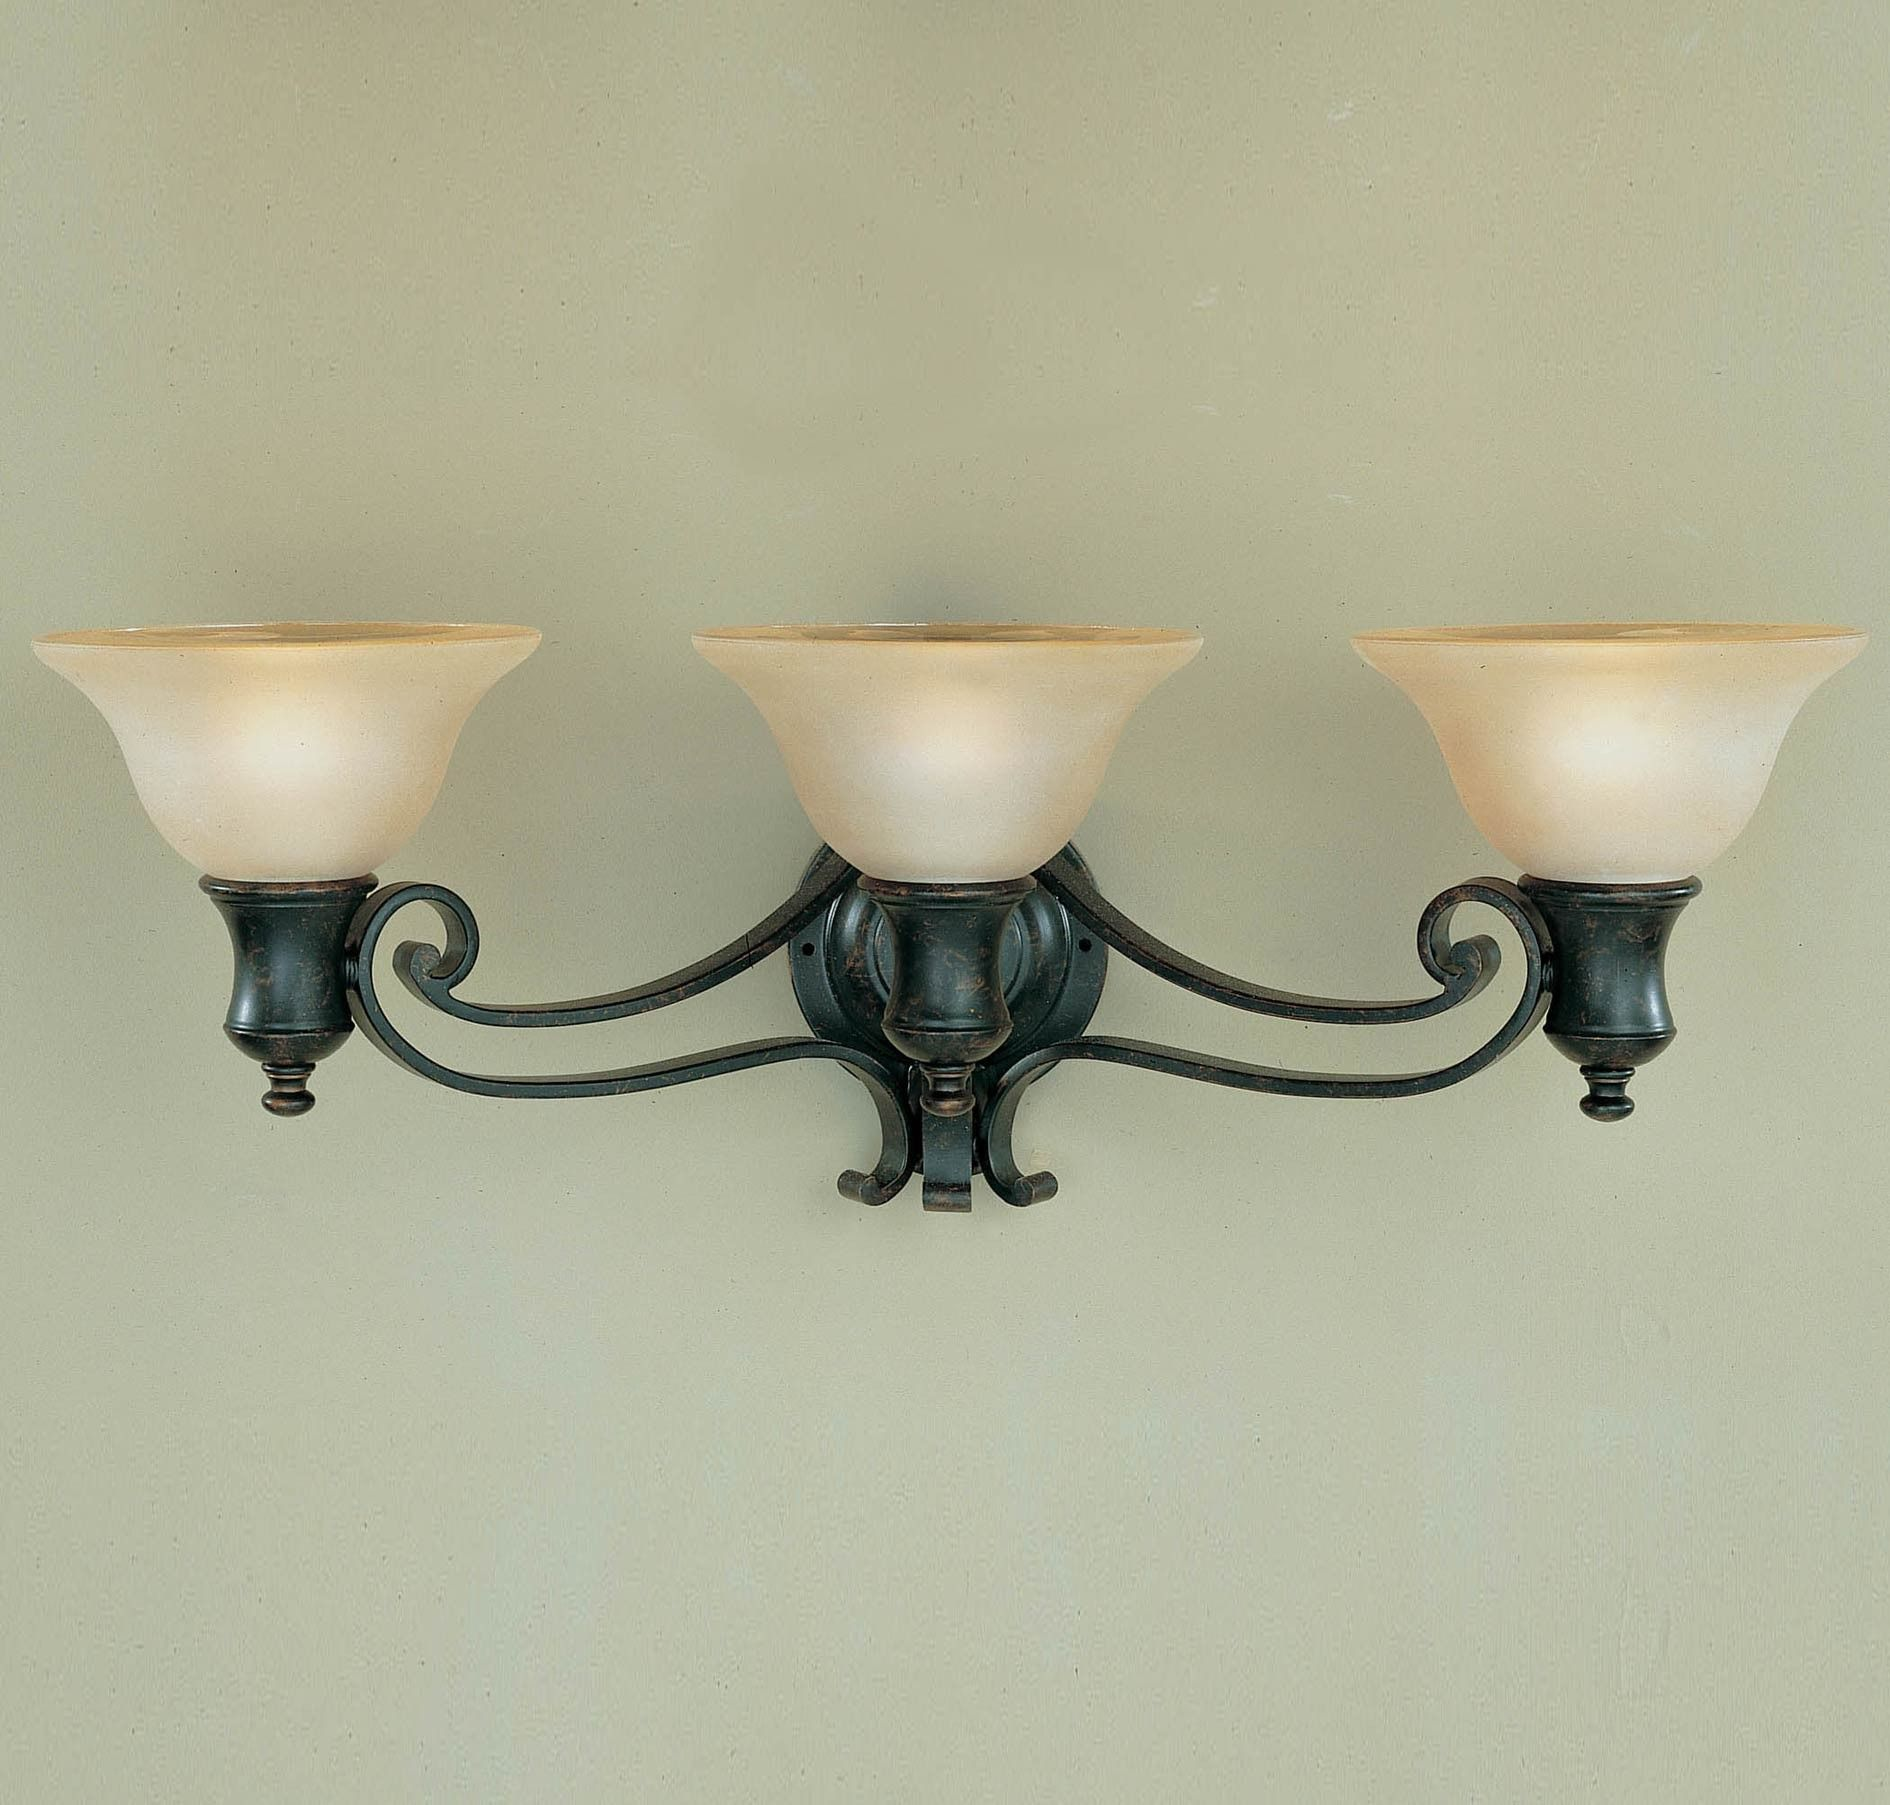 Feiss Cervantes 3-Light Vanity Fixture in Wall Lights, Bath Lights ...